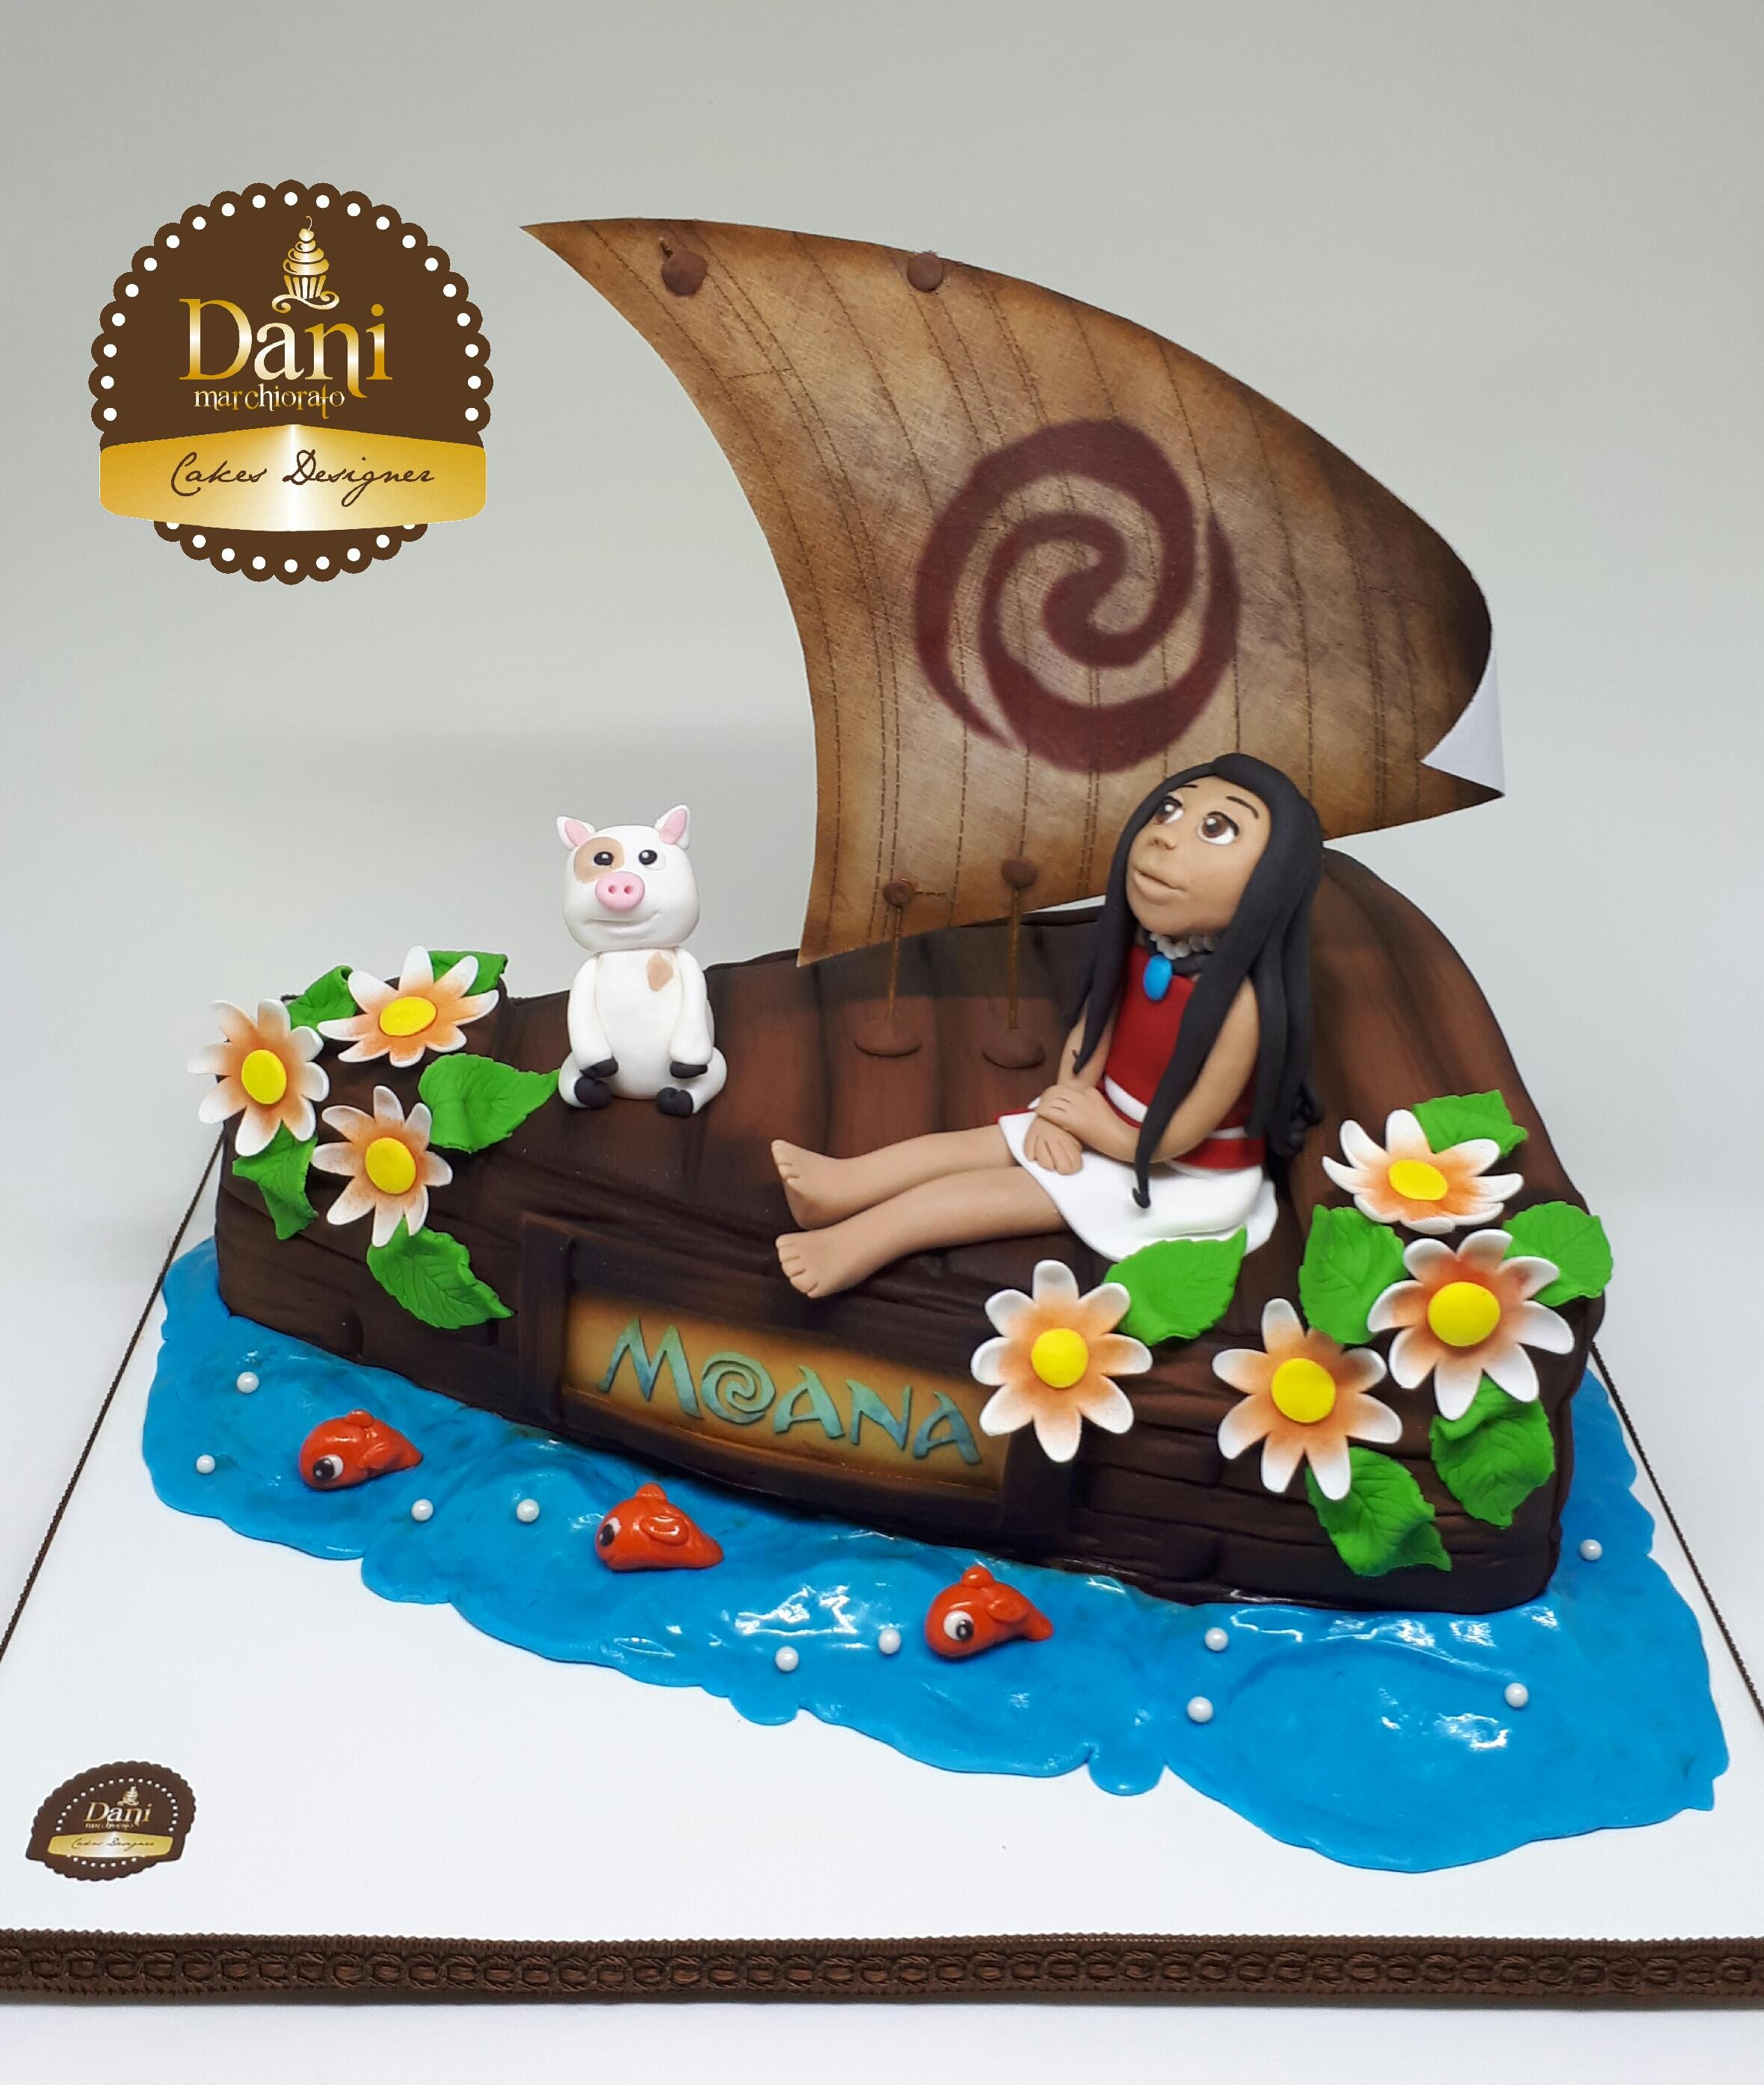 Bolo Barco Moana